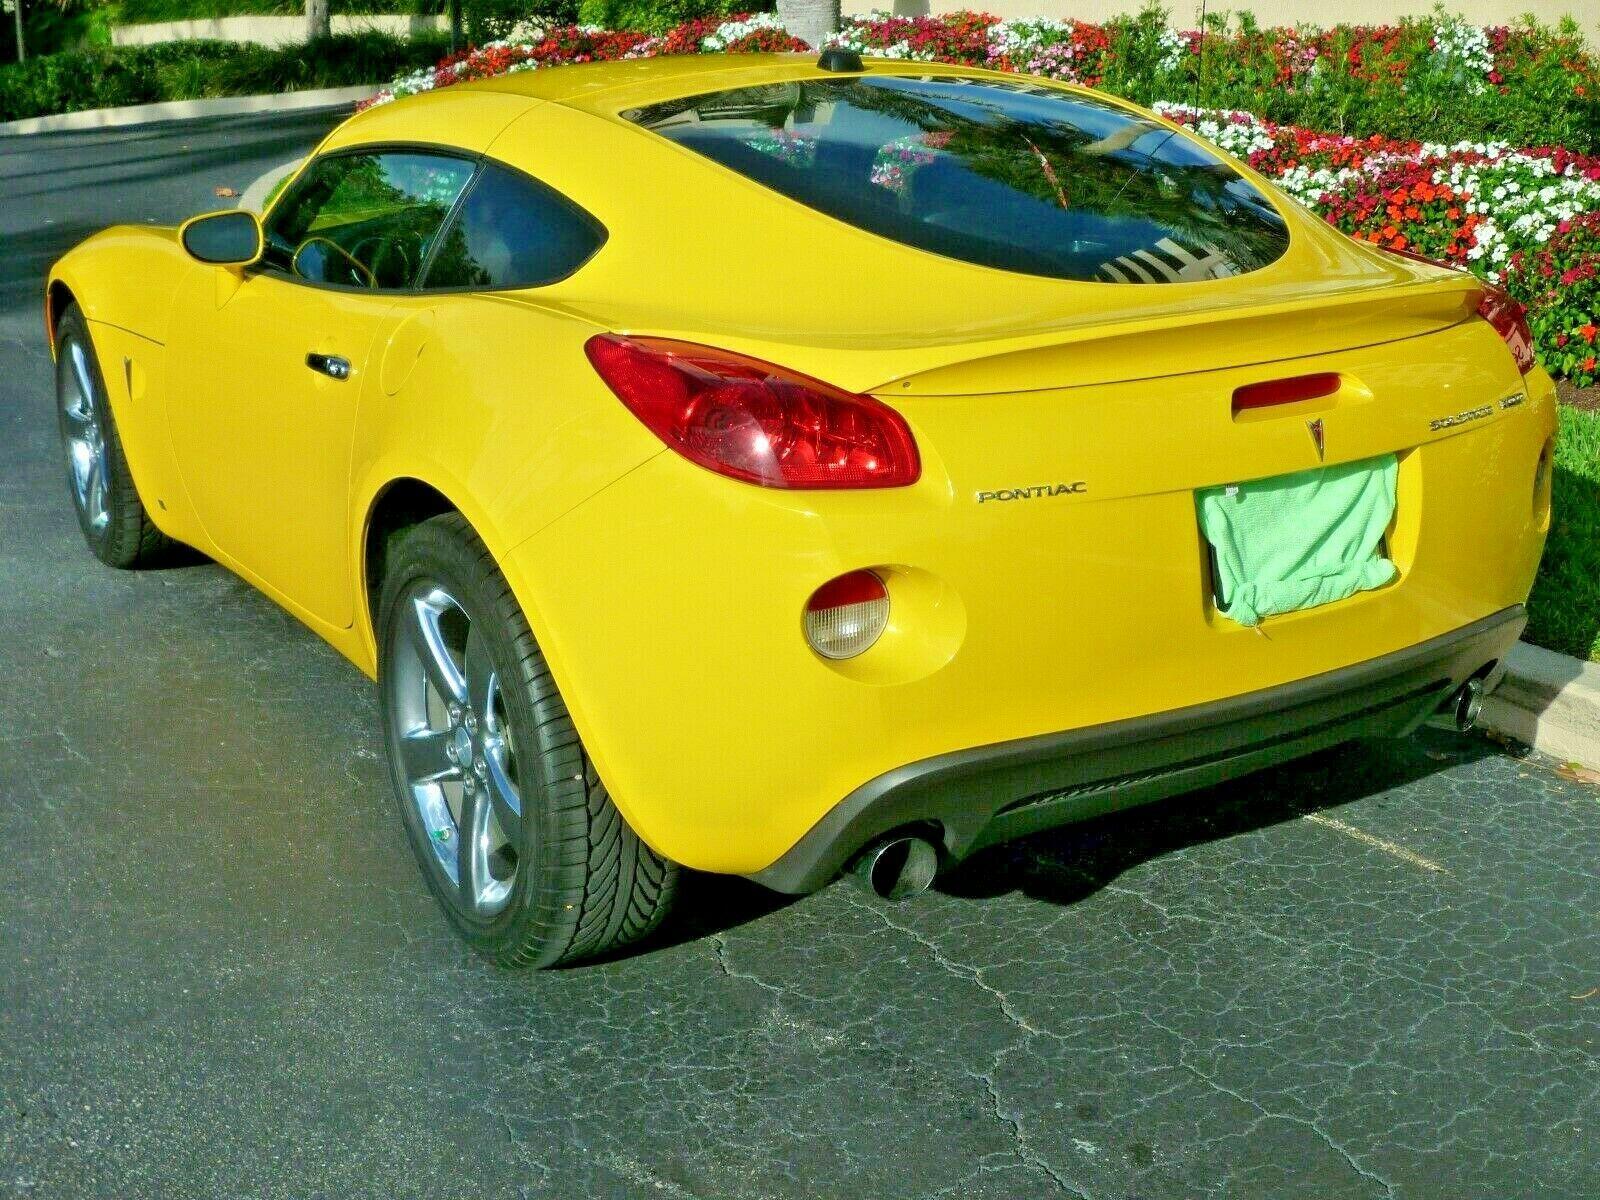 2006 Pontiac Solstice GXP coupe hard top